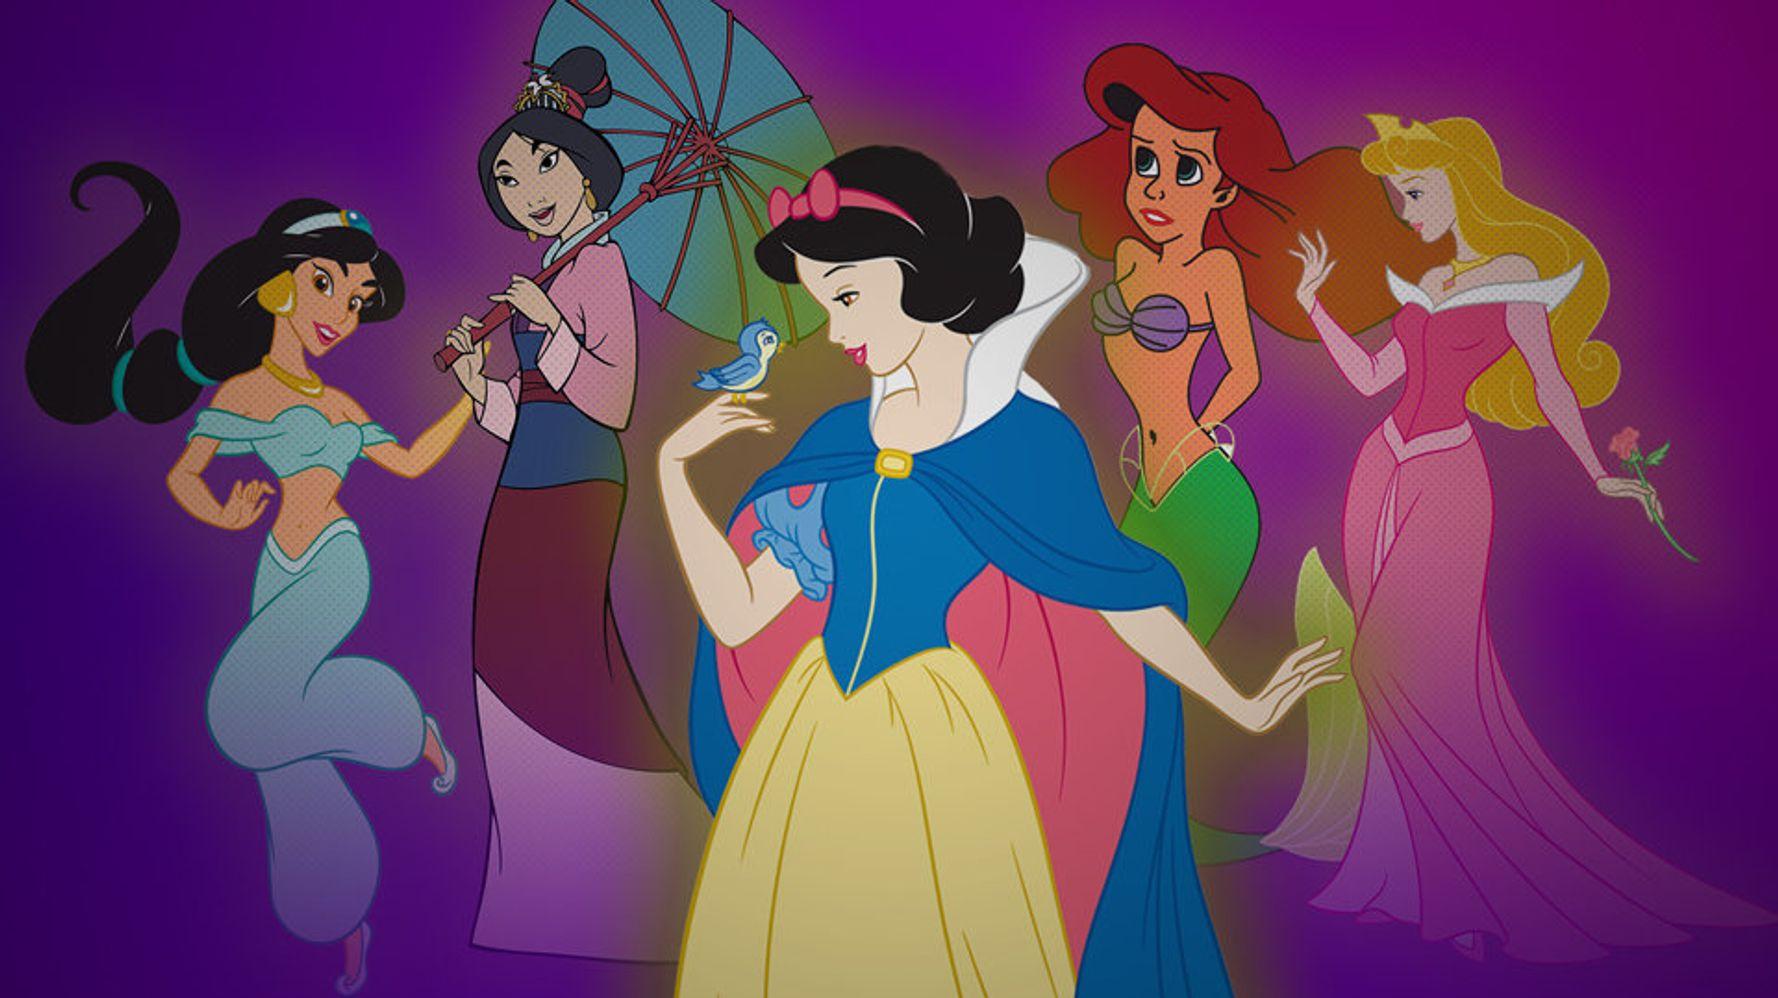 easy all disney princesses together